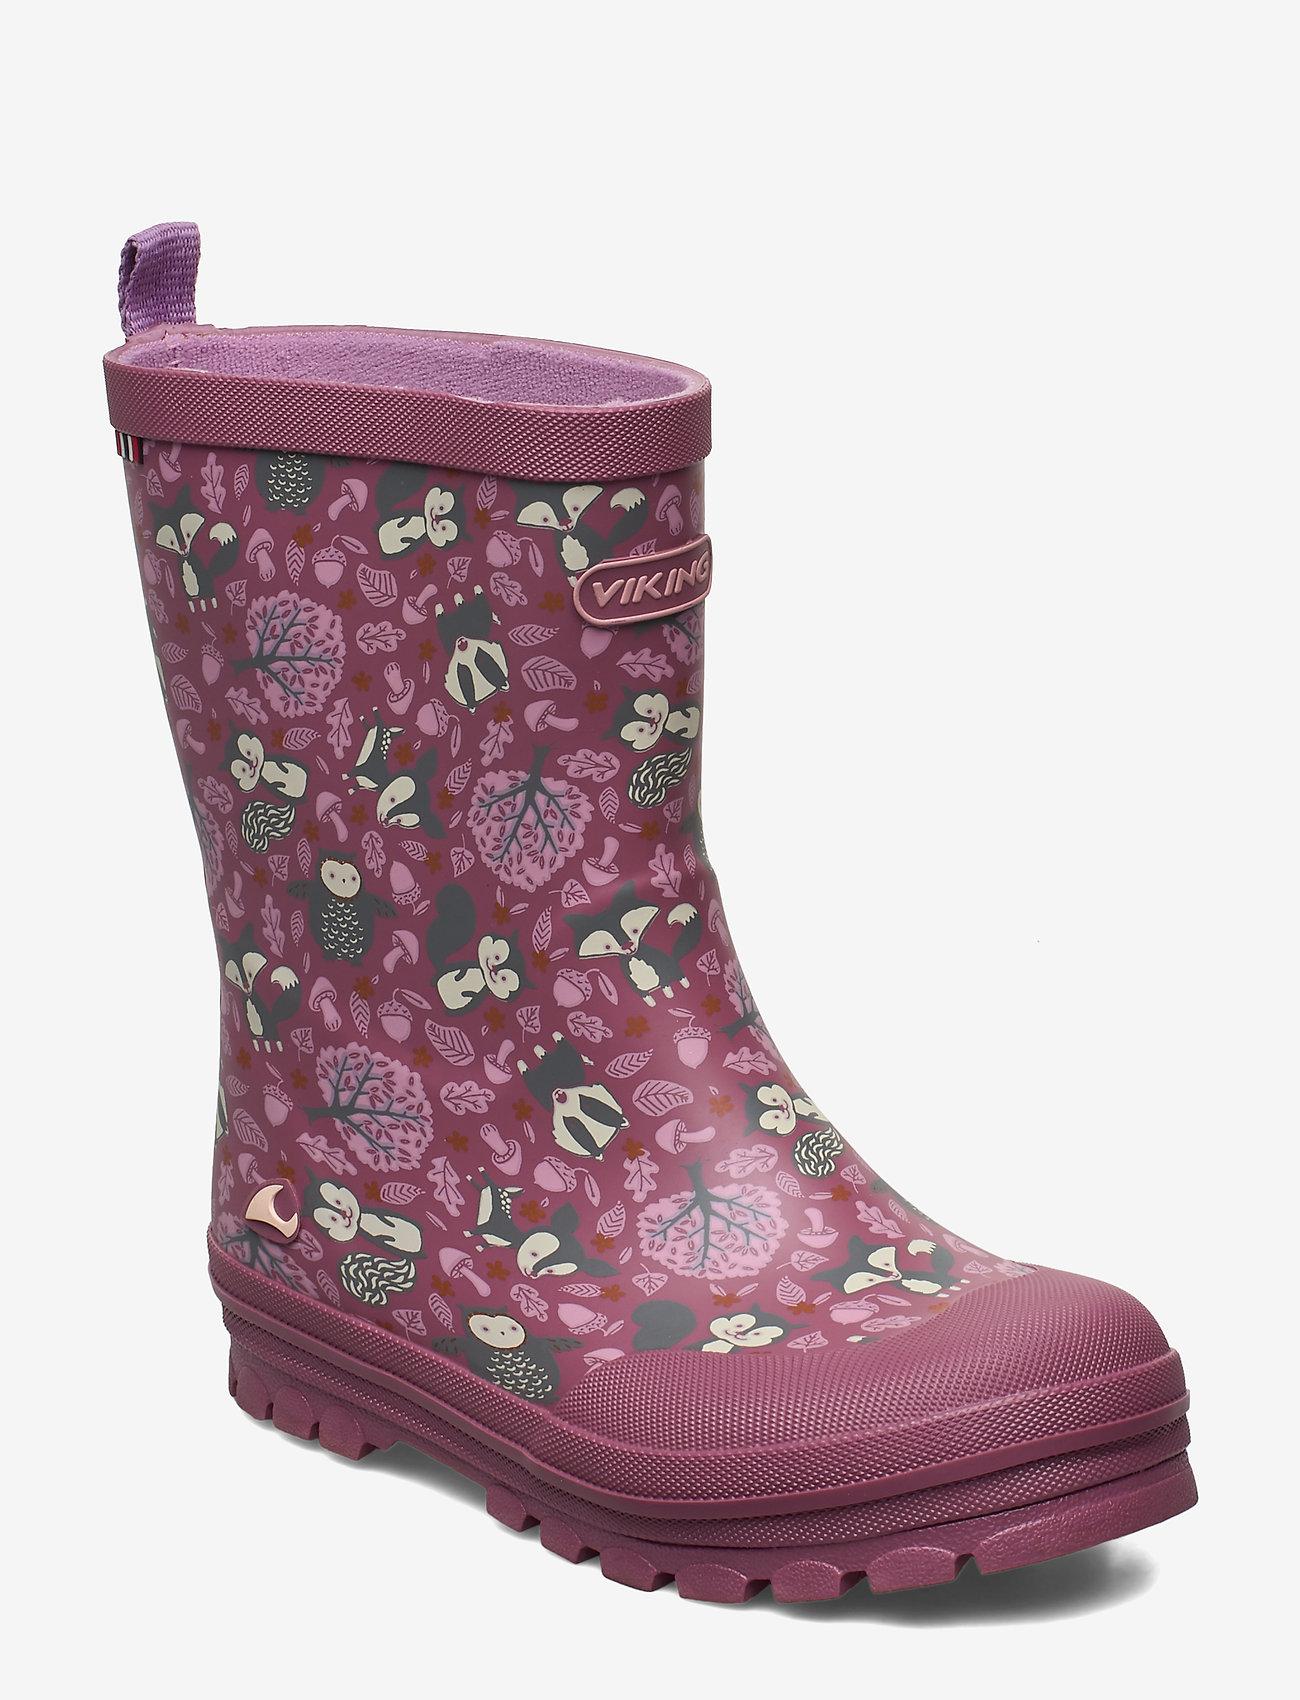 Viking - Jolly Woodland - unlined rubberboots - dark pink/multi - 0